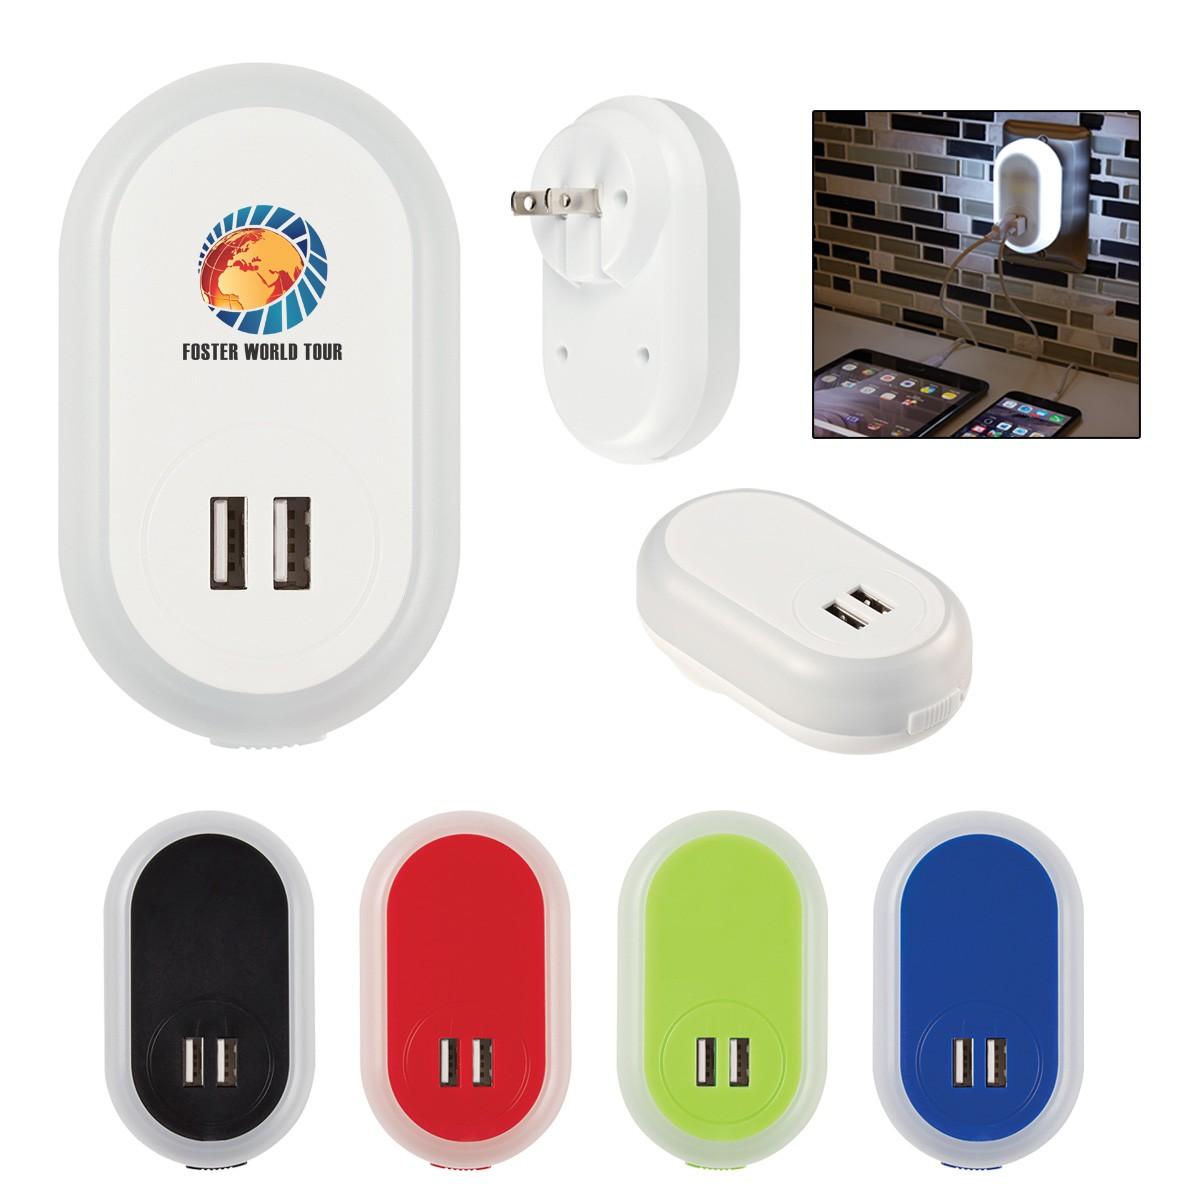 custom-usb-charger-nightlight